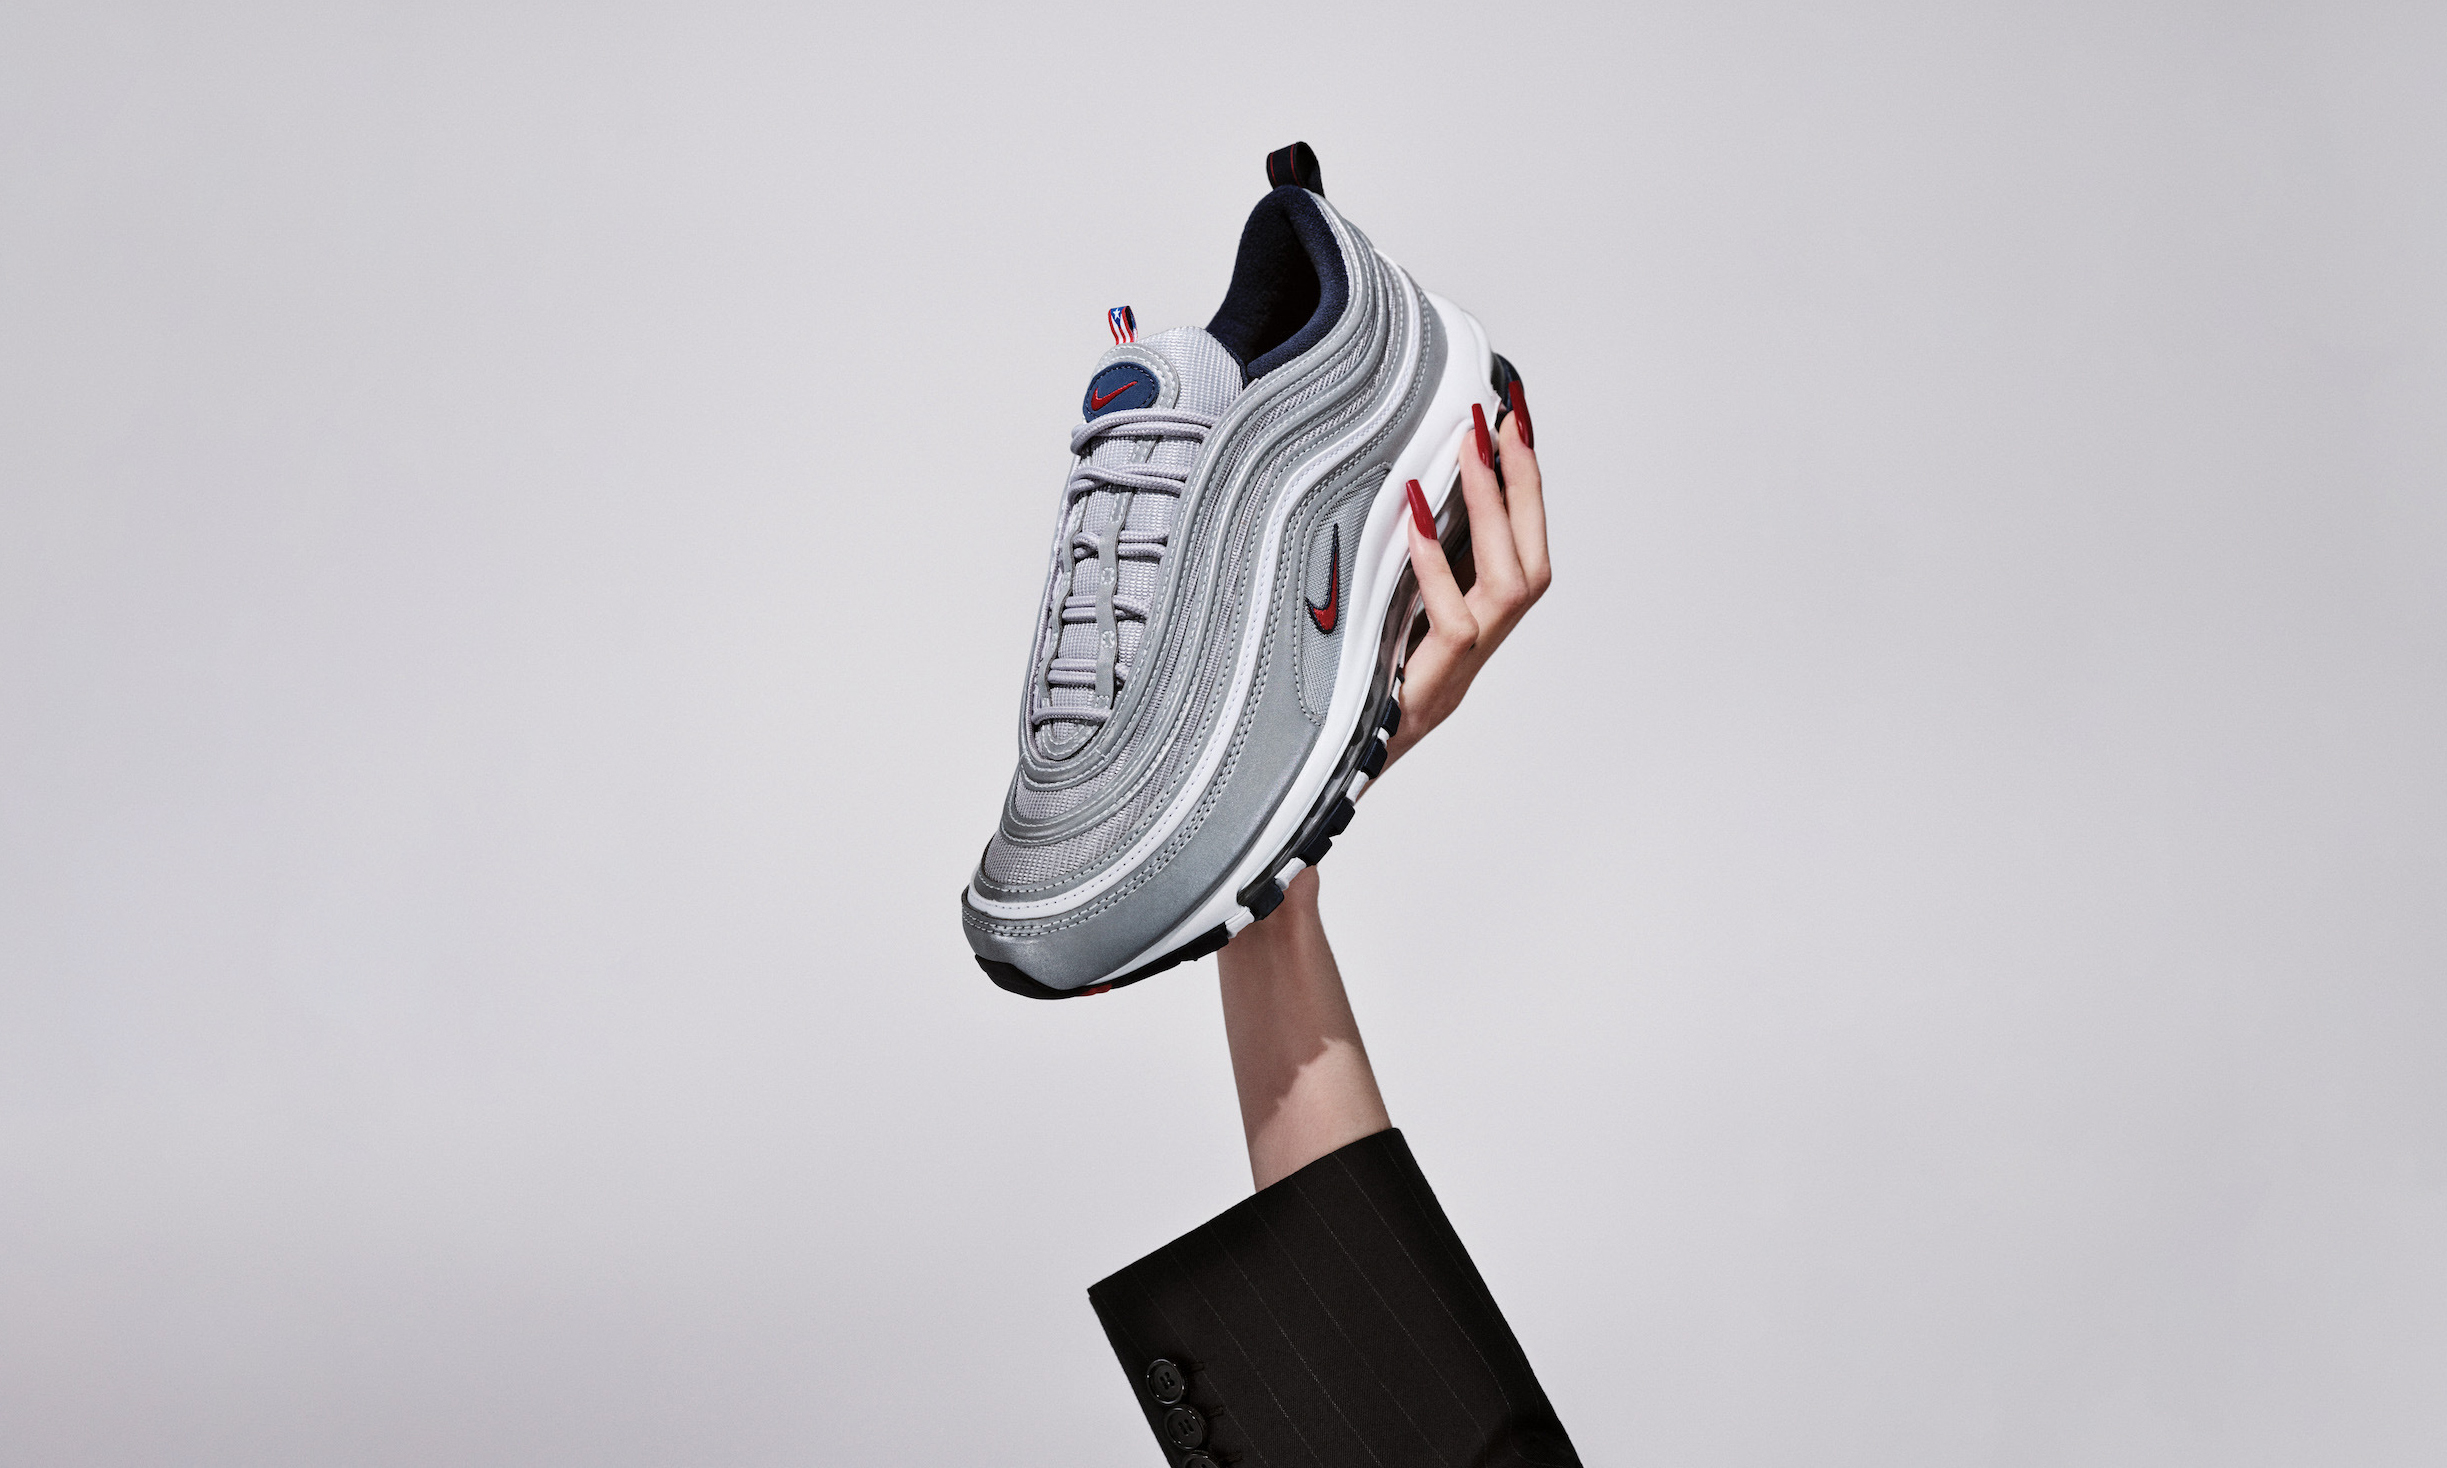 激似「银子弹」,Nike Air Max 97「Puerto Rico」即将发售